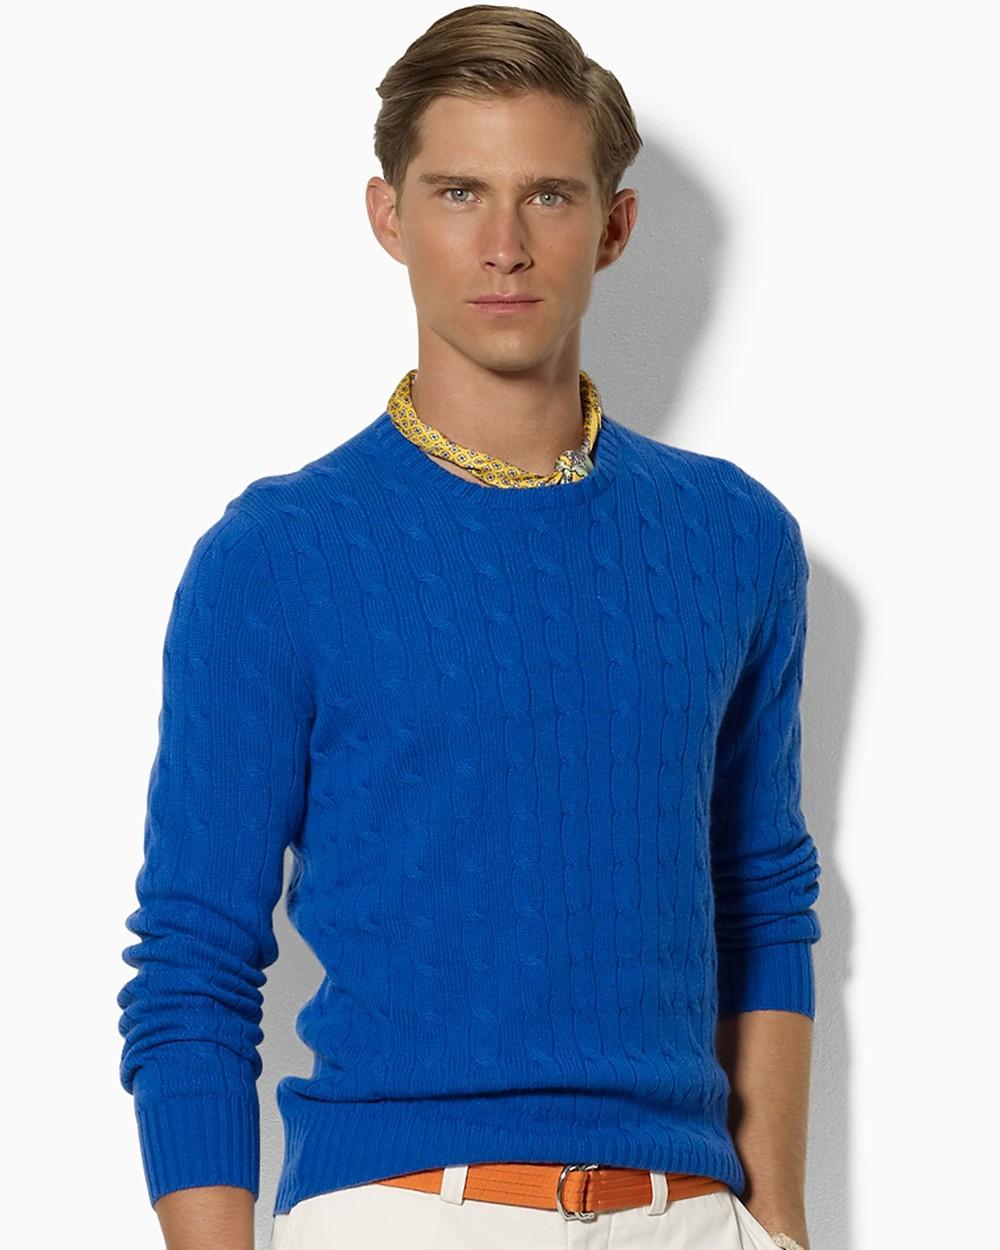 PoloSweater.jpg